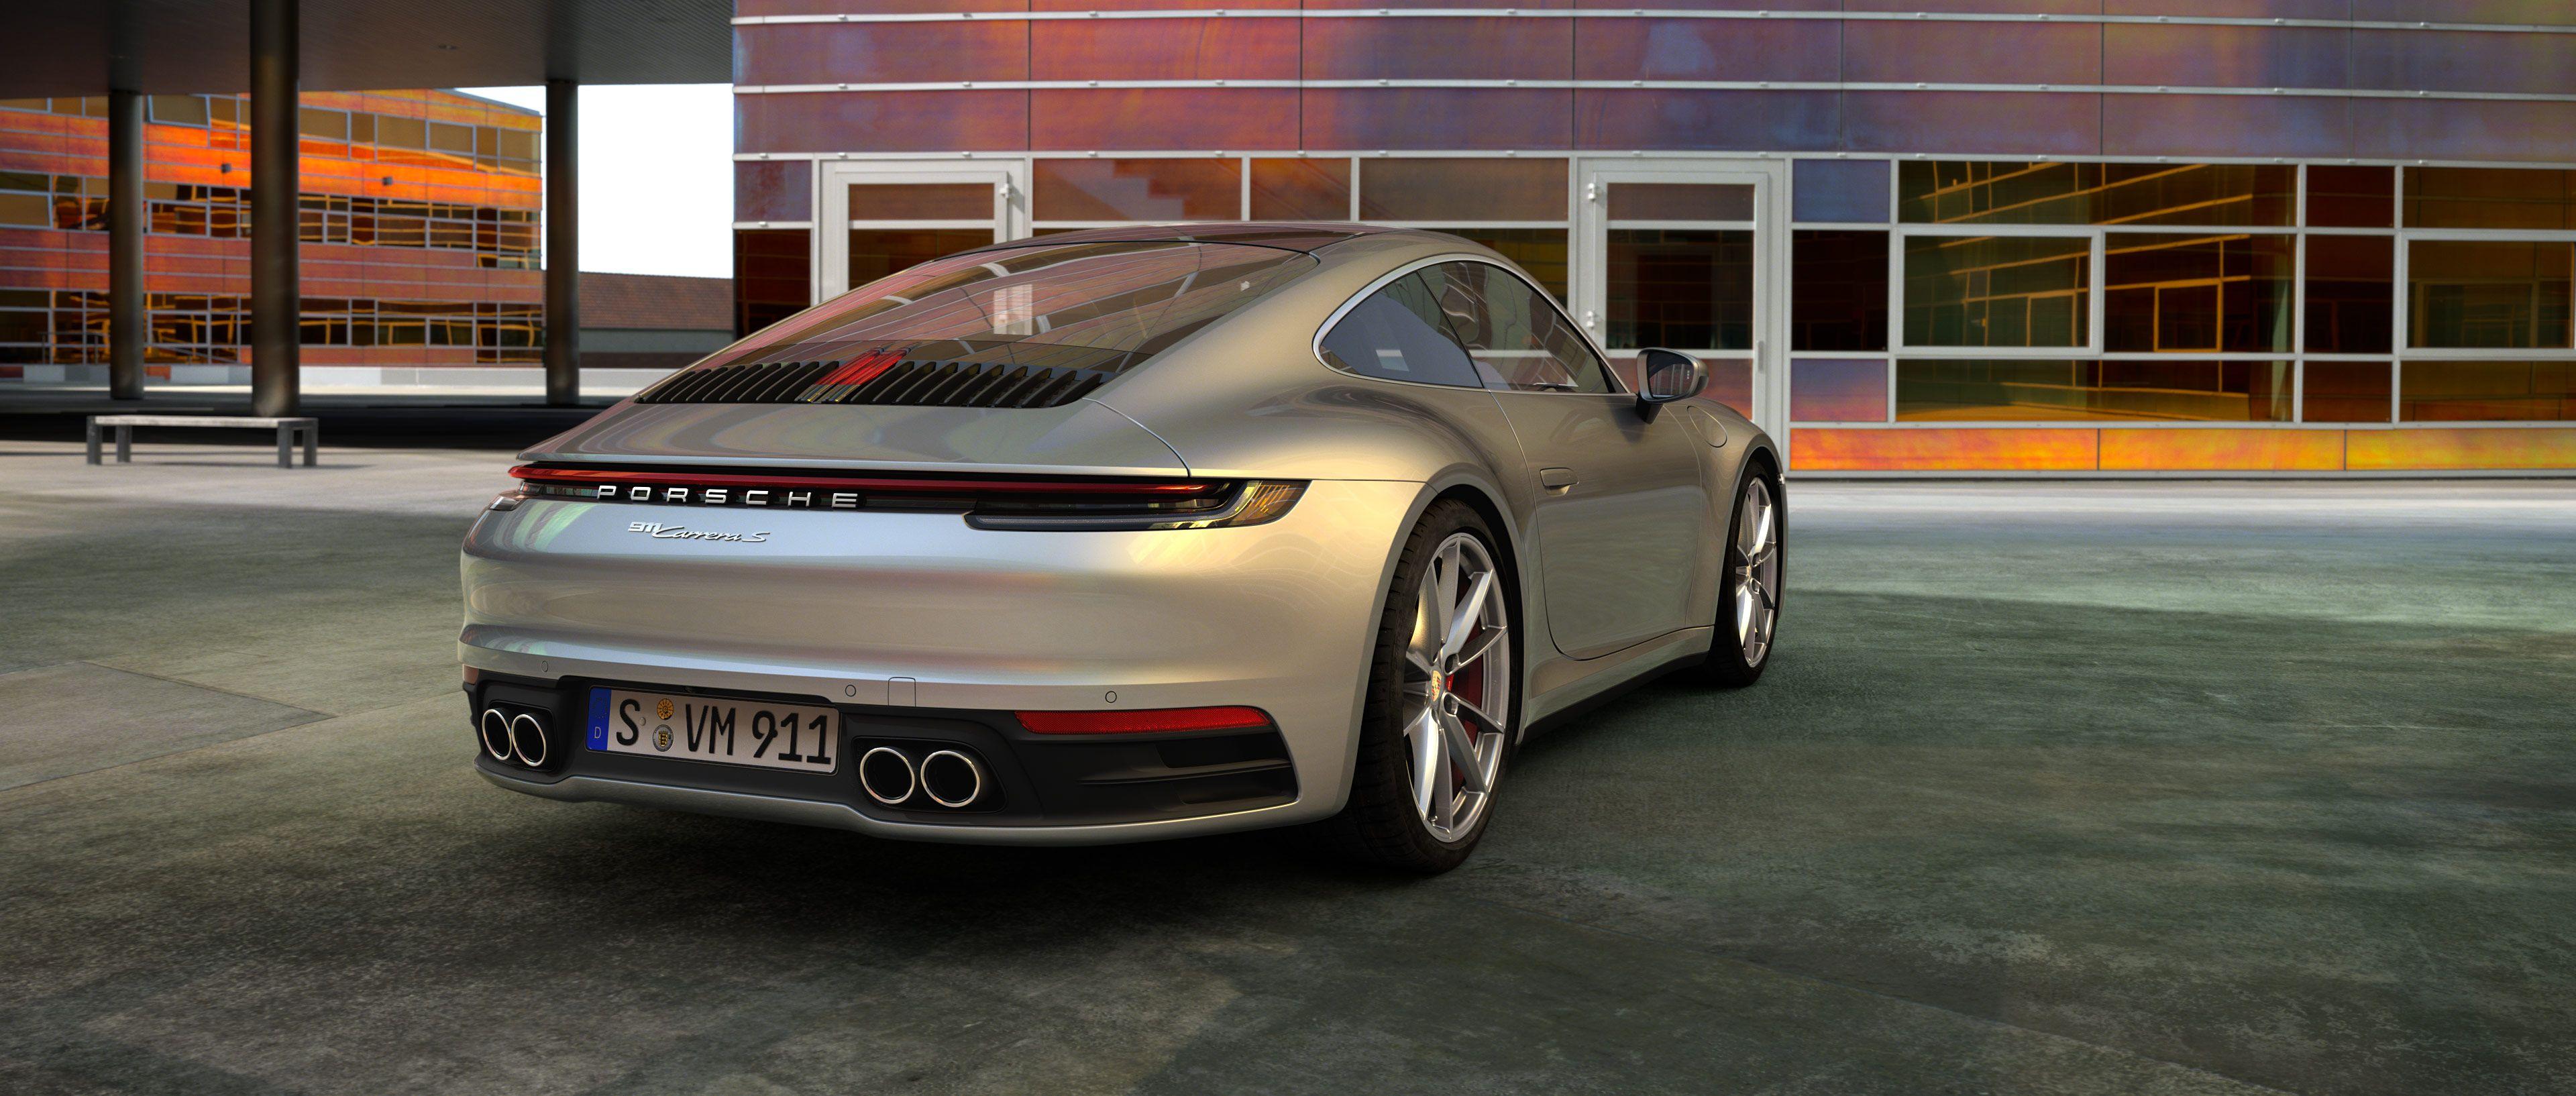 Porsche Showrooms Porsche Service Centre in delhi